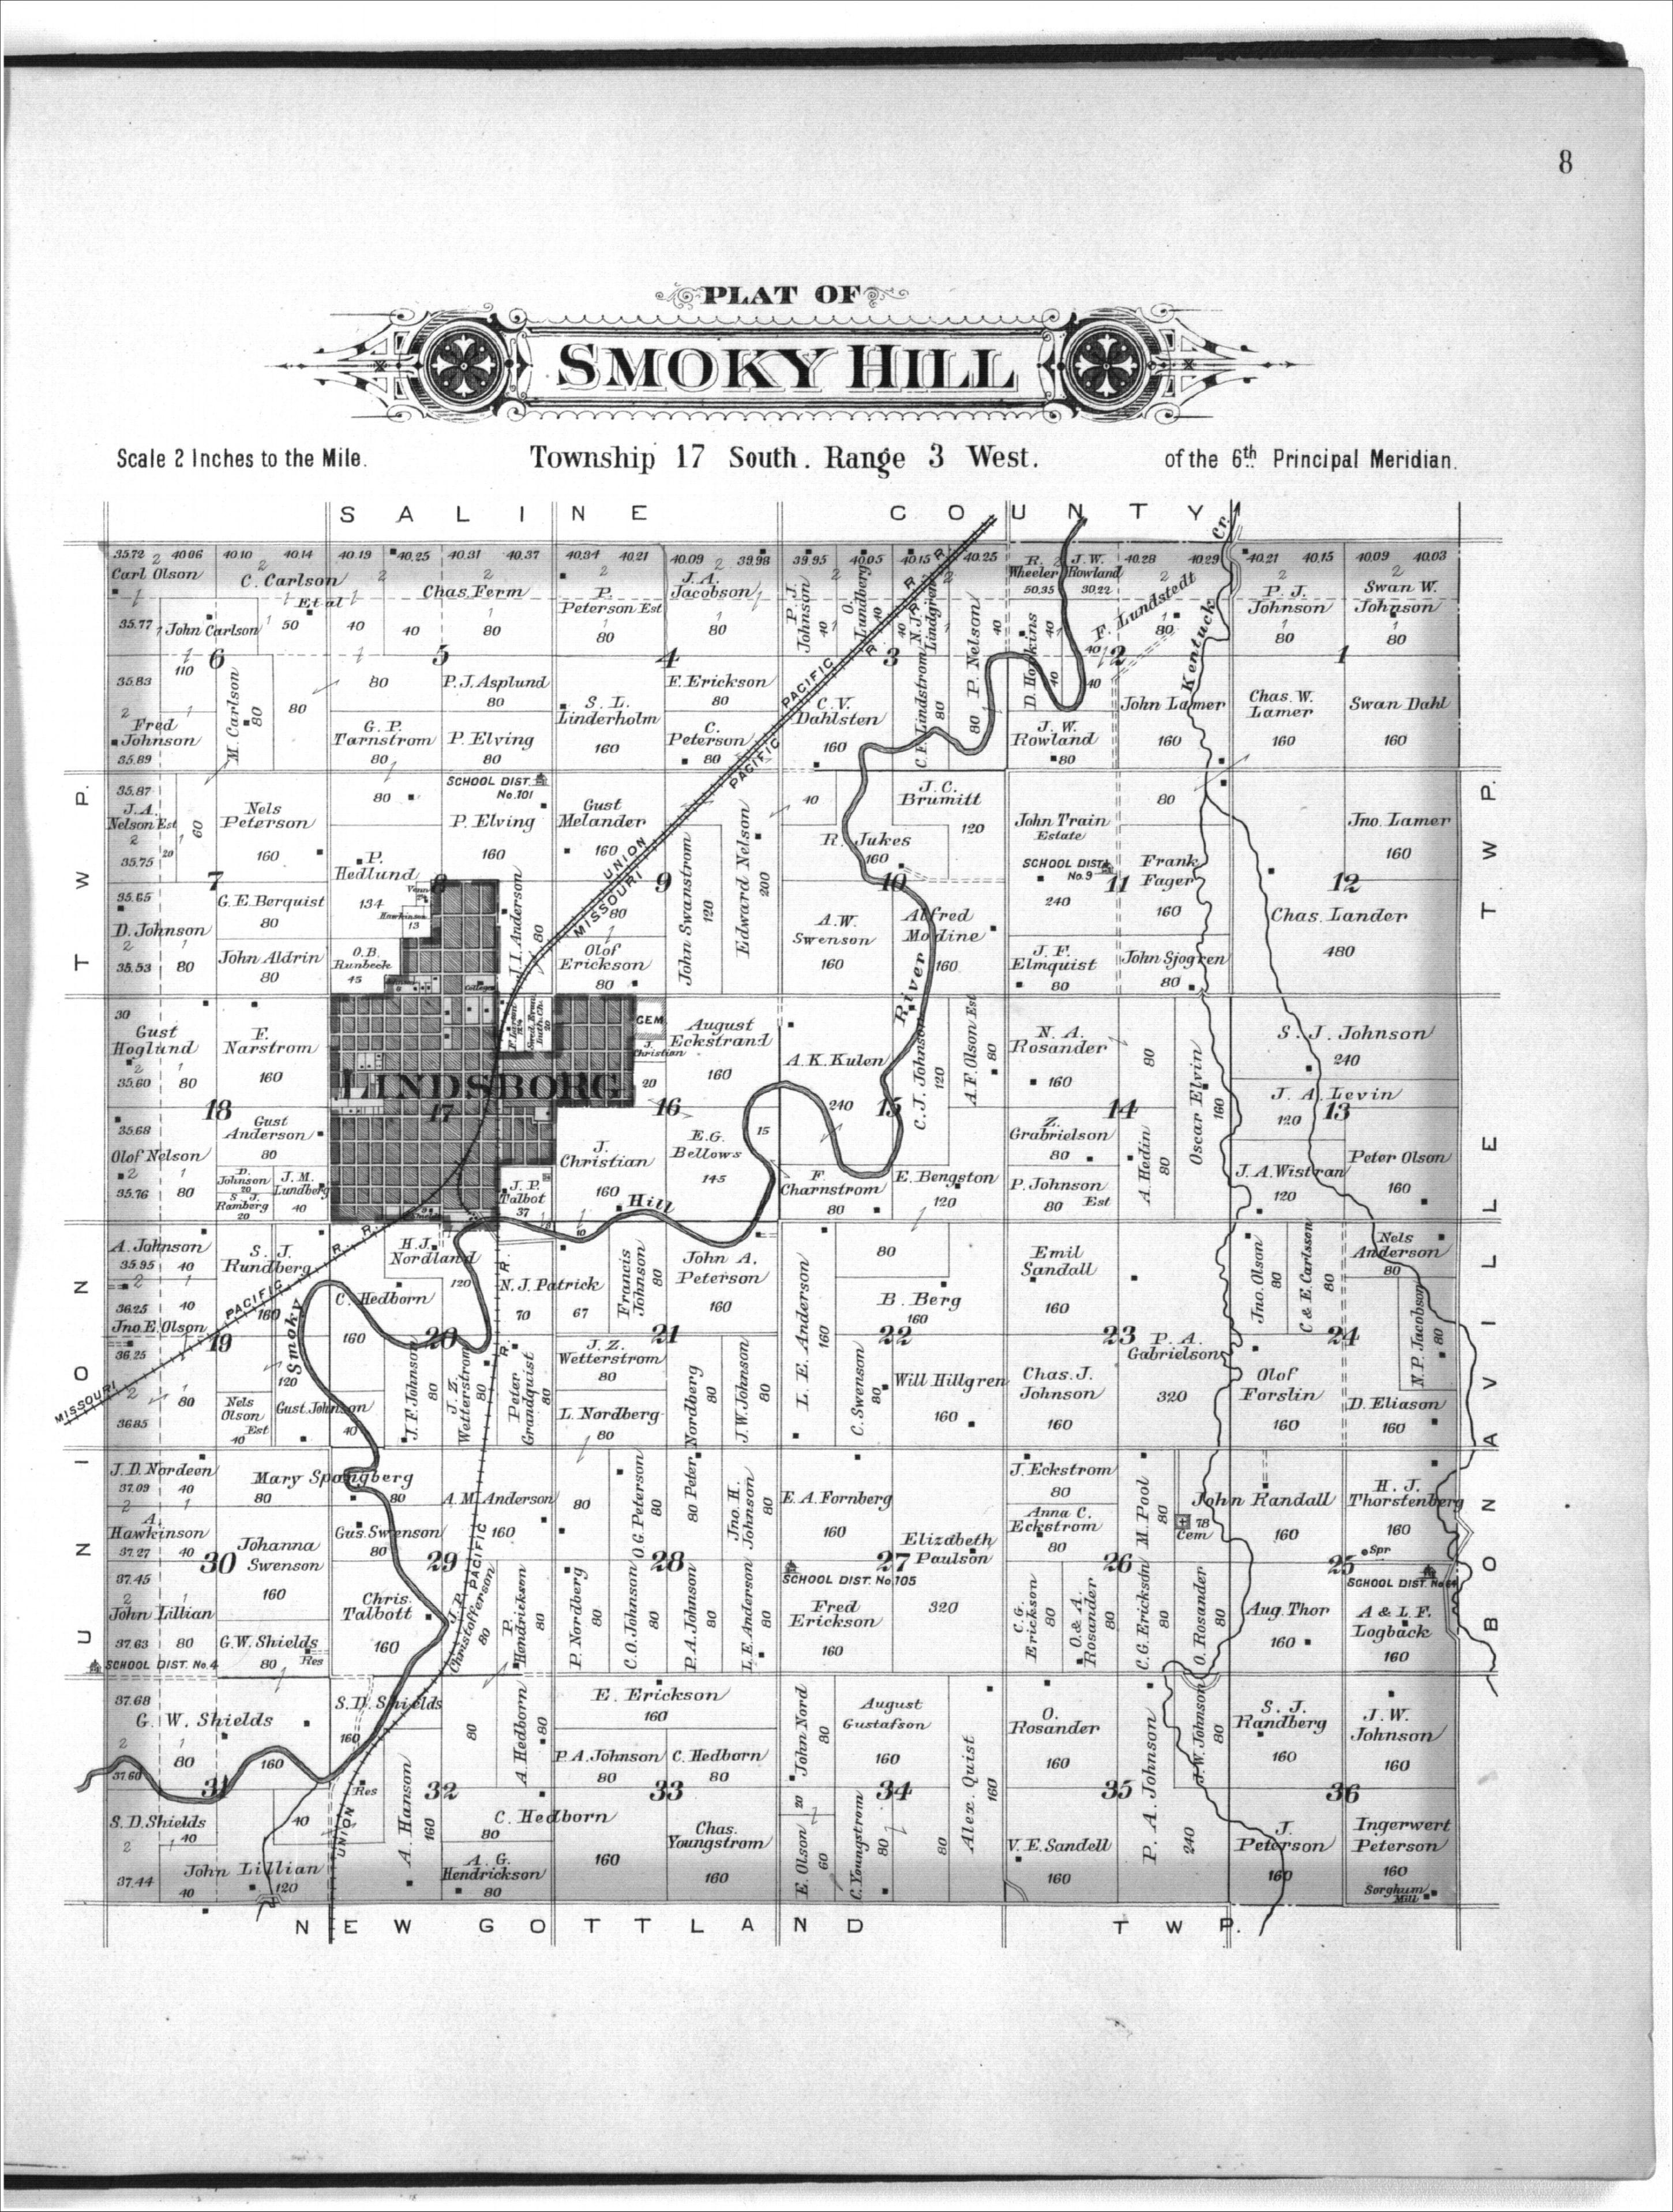 Plat book of McPherson County, Kansas - 8